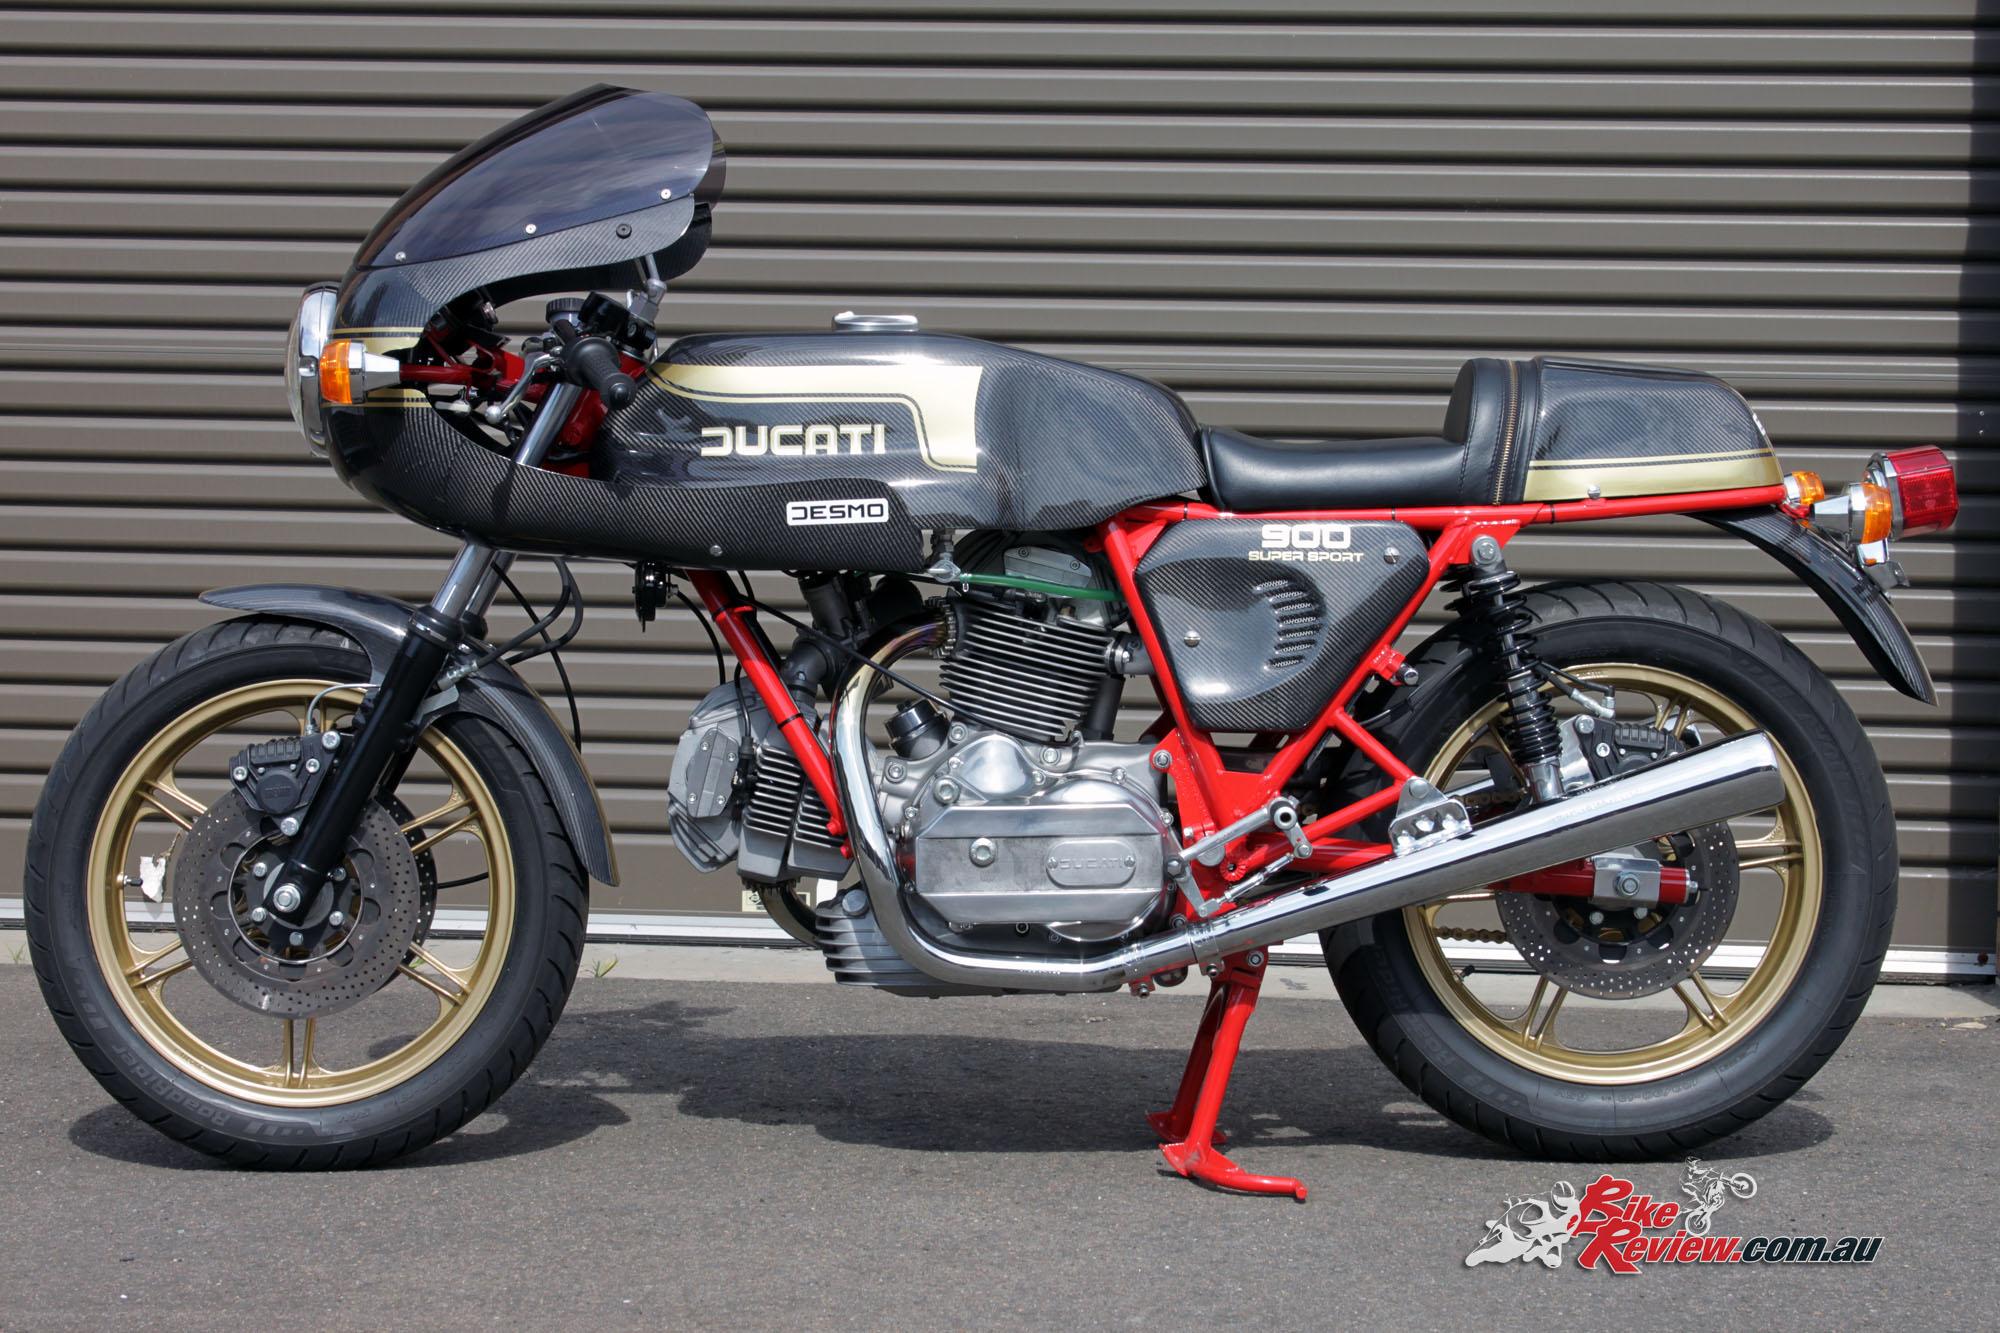 Ducati Ss Replica Fairing